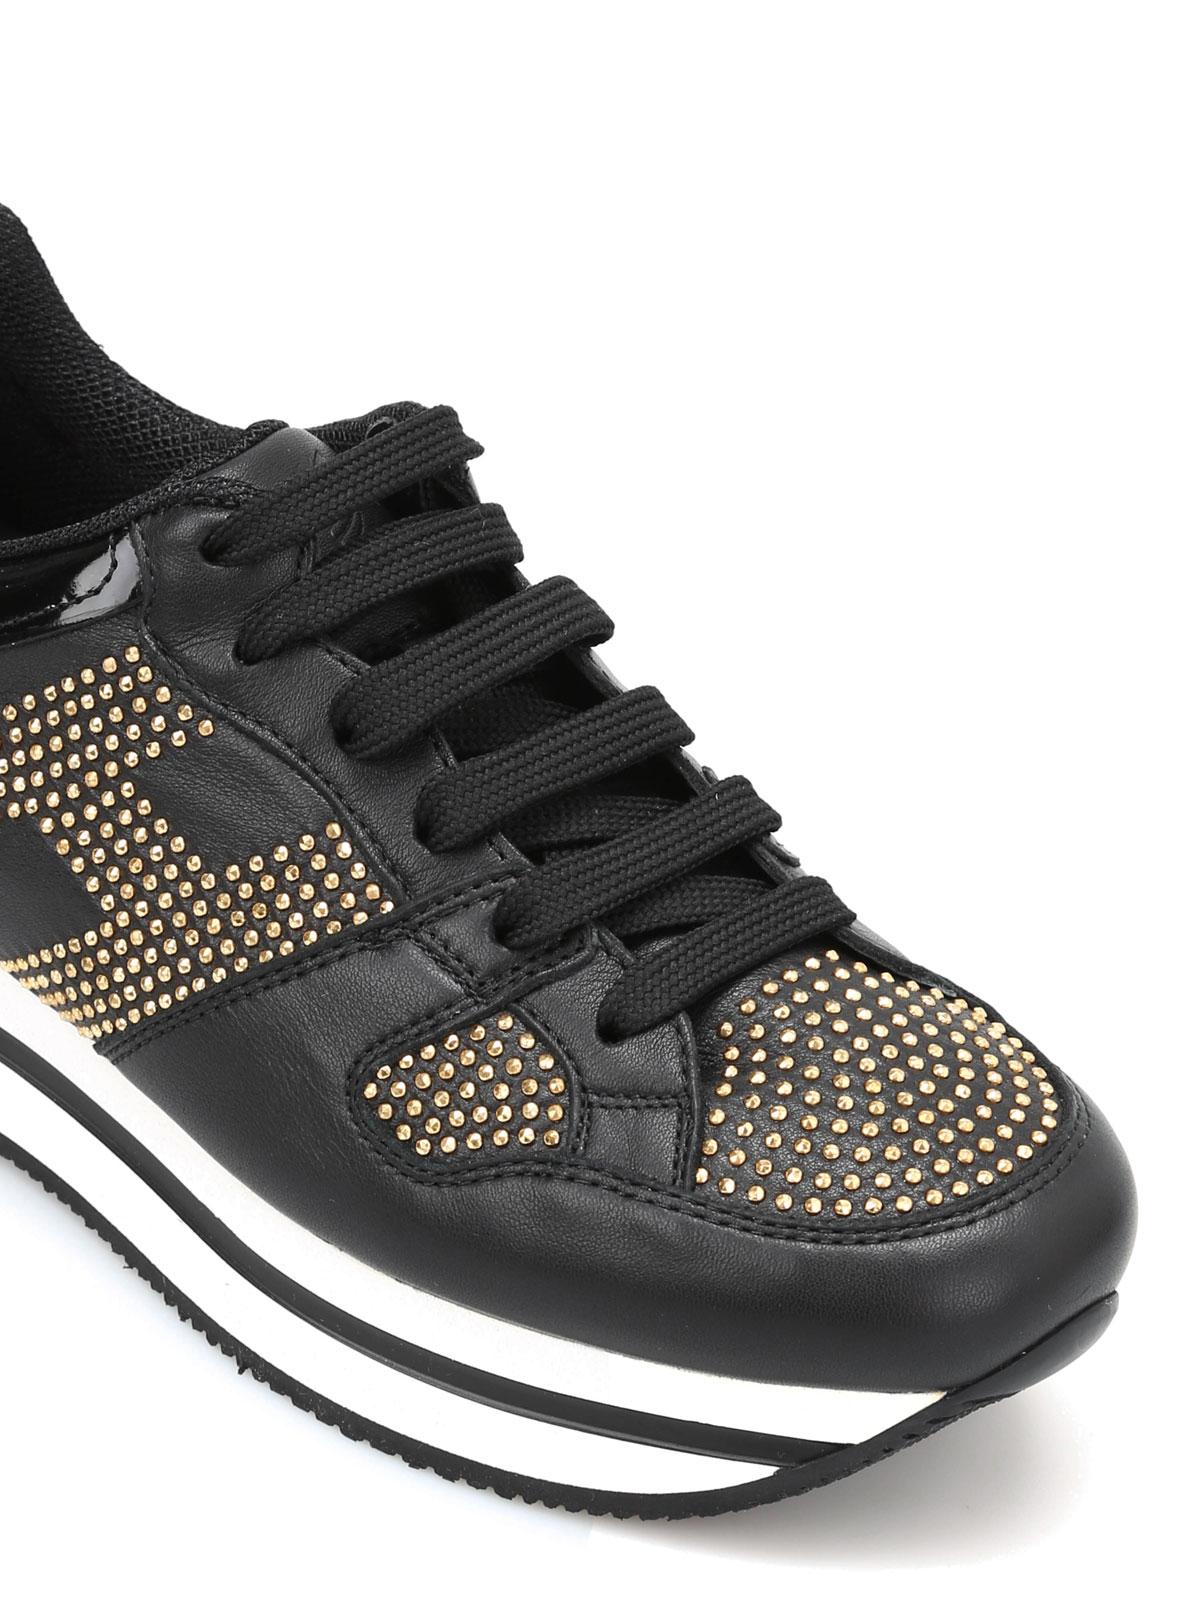 Hogan - Sneaker H222 Club con borchie - sneakers - GYW2220W780F7FB999